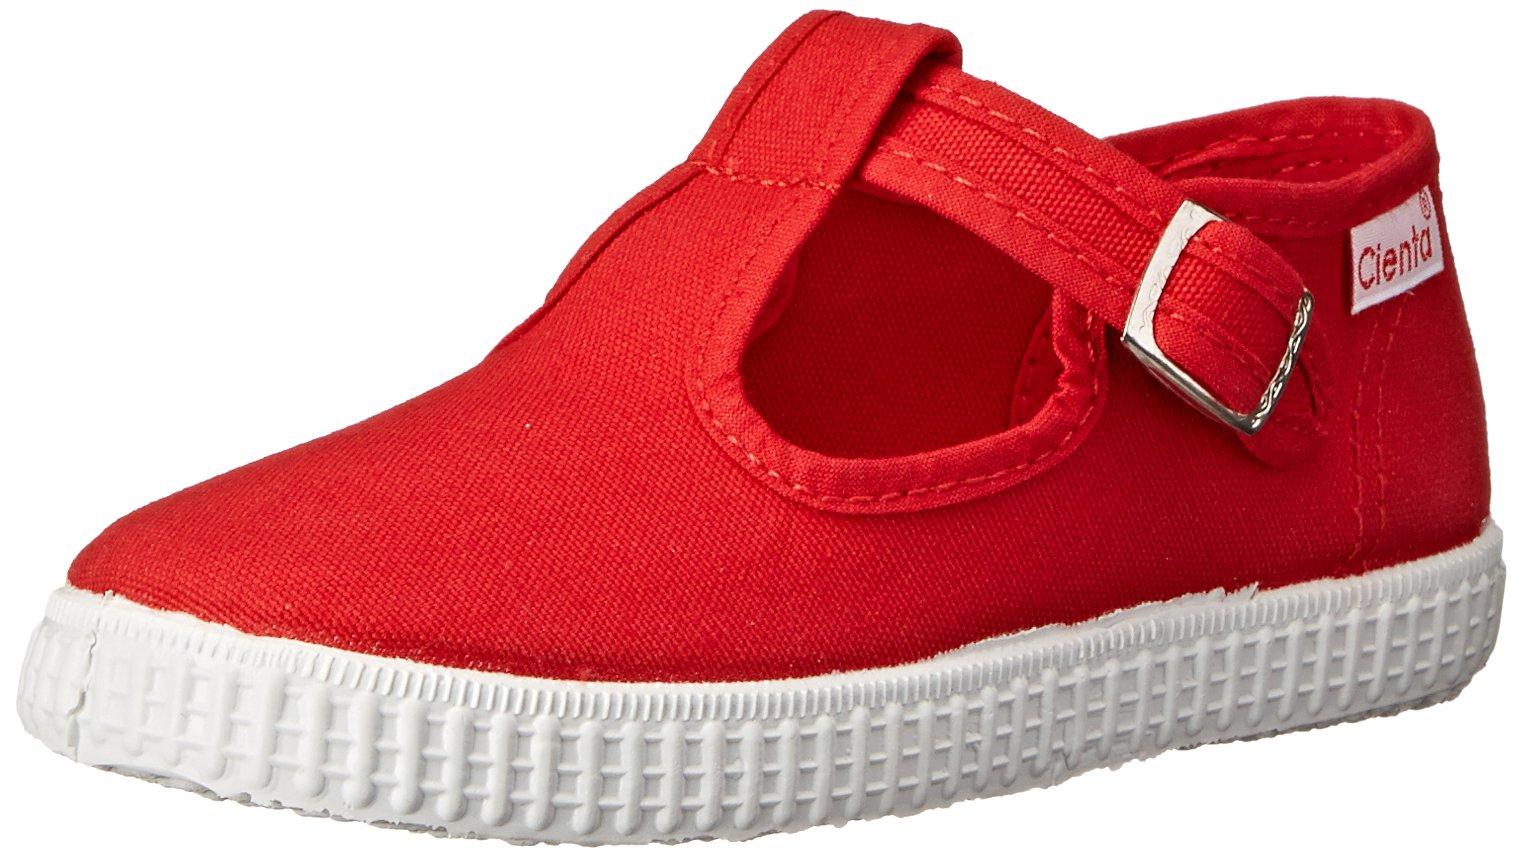 Cienta 51000 T-Strap Fashion Sneaker, Red, 21 EU/5 M US Toddler